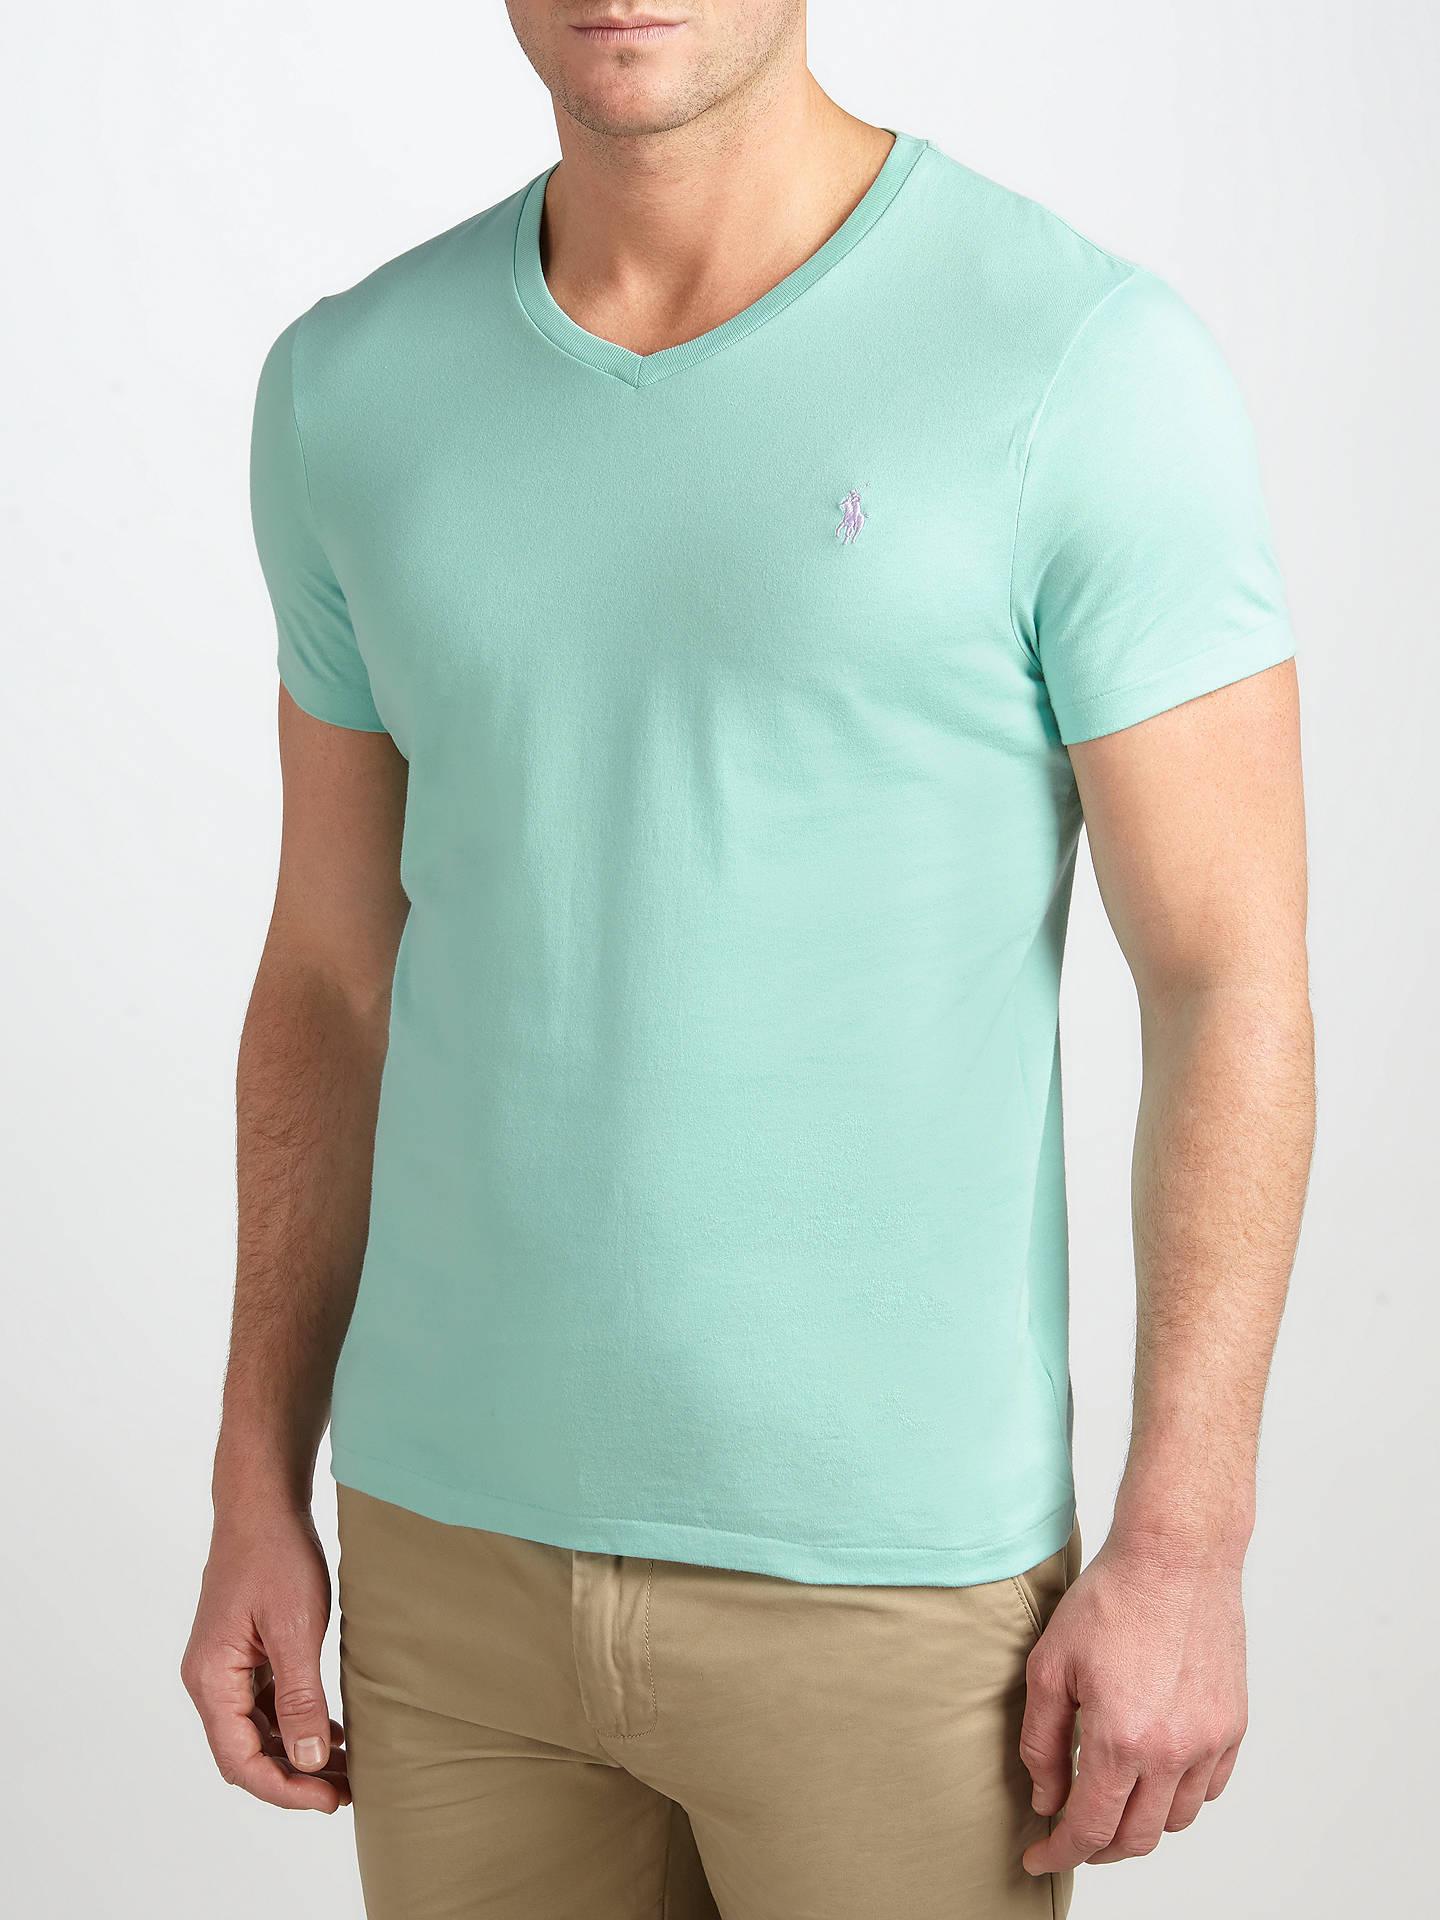 Lauren Neck Shirt John At Partners V Lewisamp; Short Ralph Polo Sleeve T 8wm0Nn